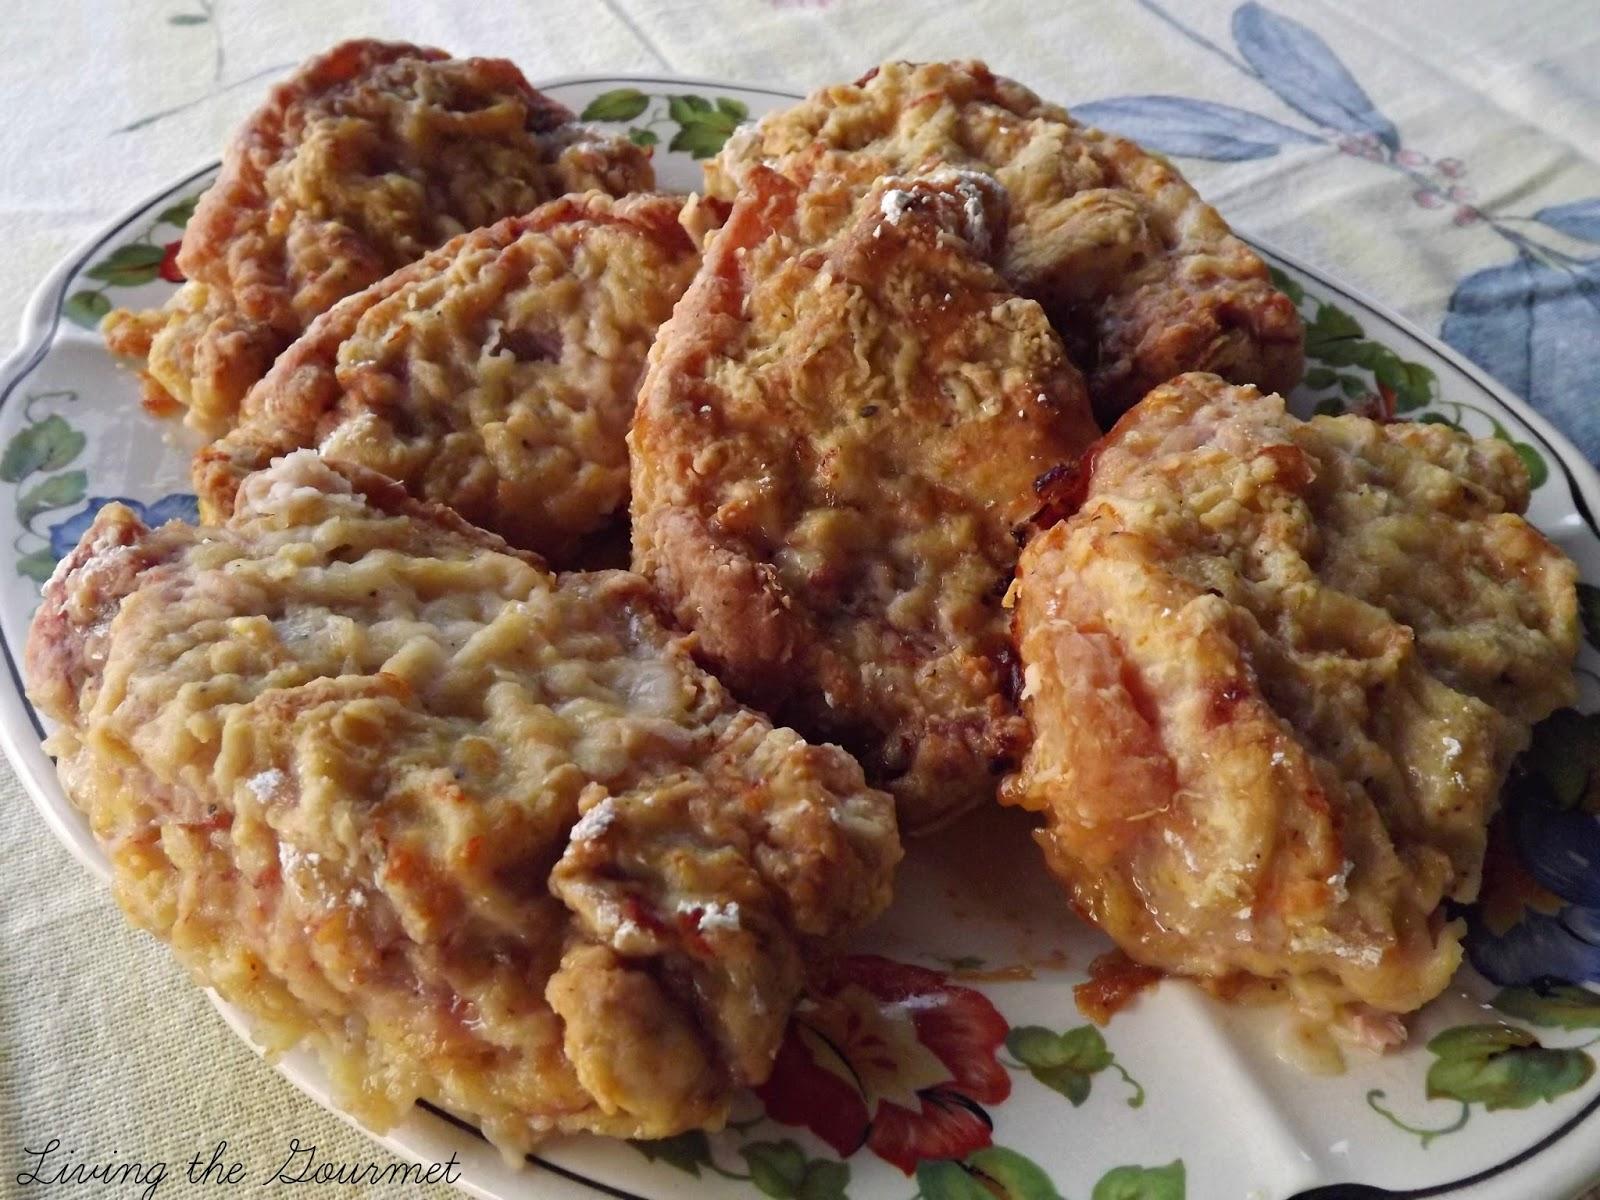 Living the Gourmet: Oven Fried Boneless Pork Chops